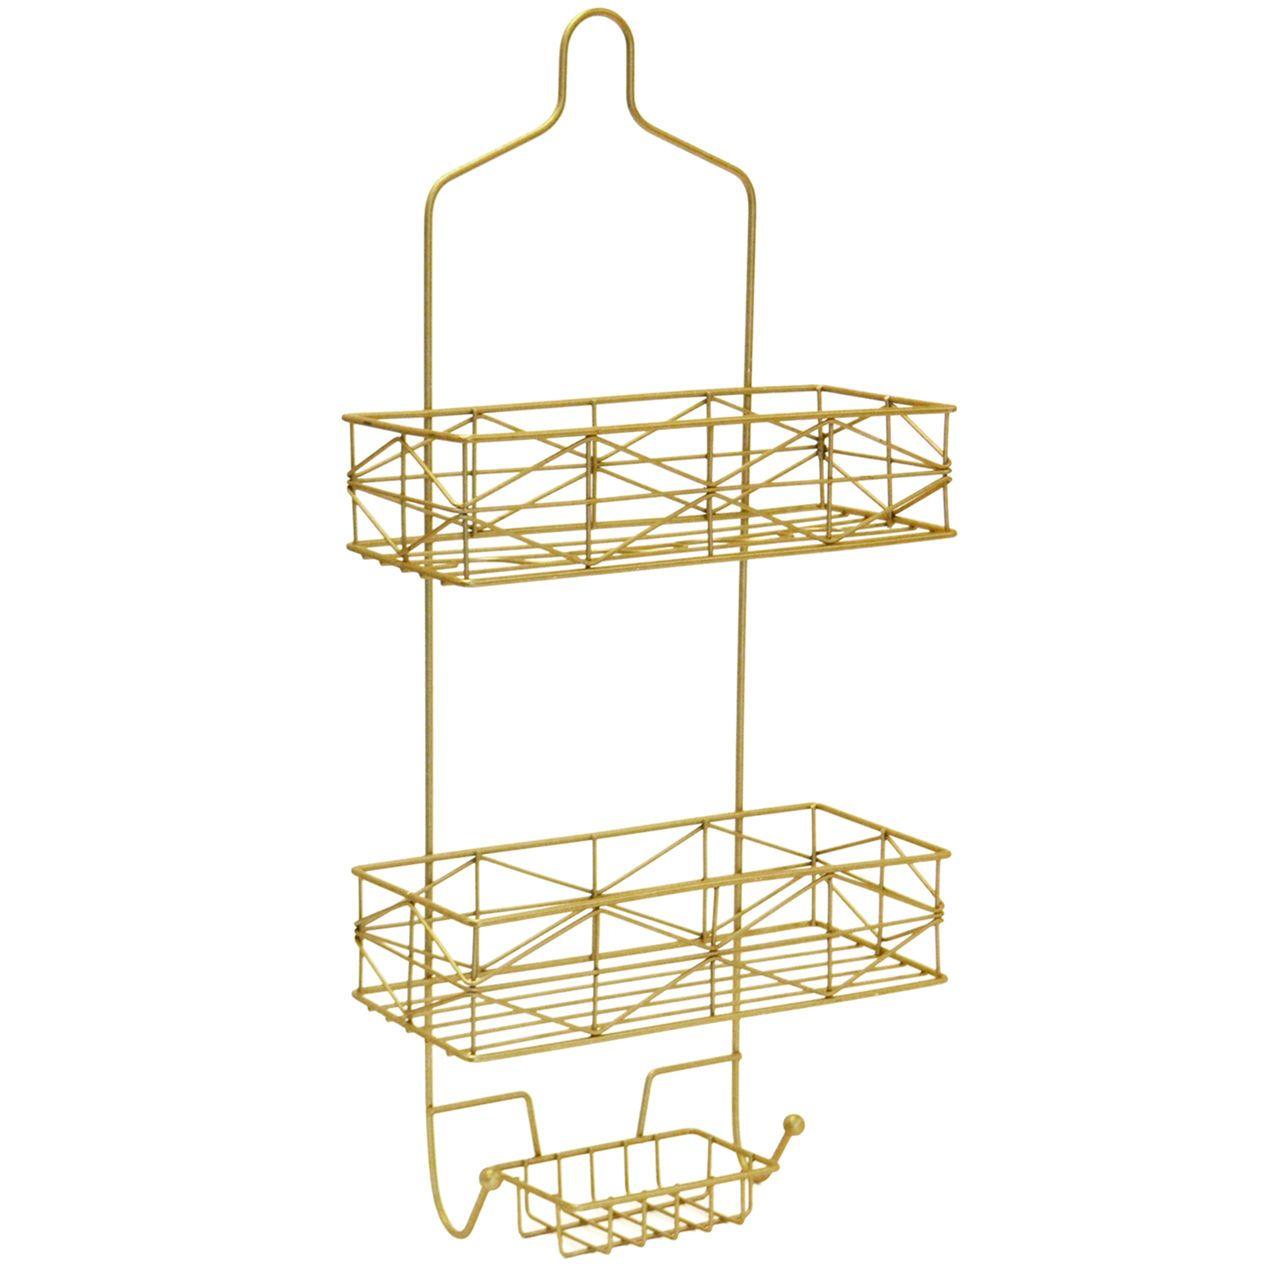 Shower Caddy Storage Basket Bathroom Gadget Ti-PVD Golden Finish //Luxury Style